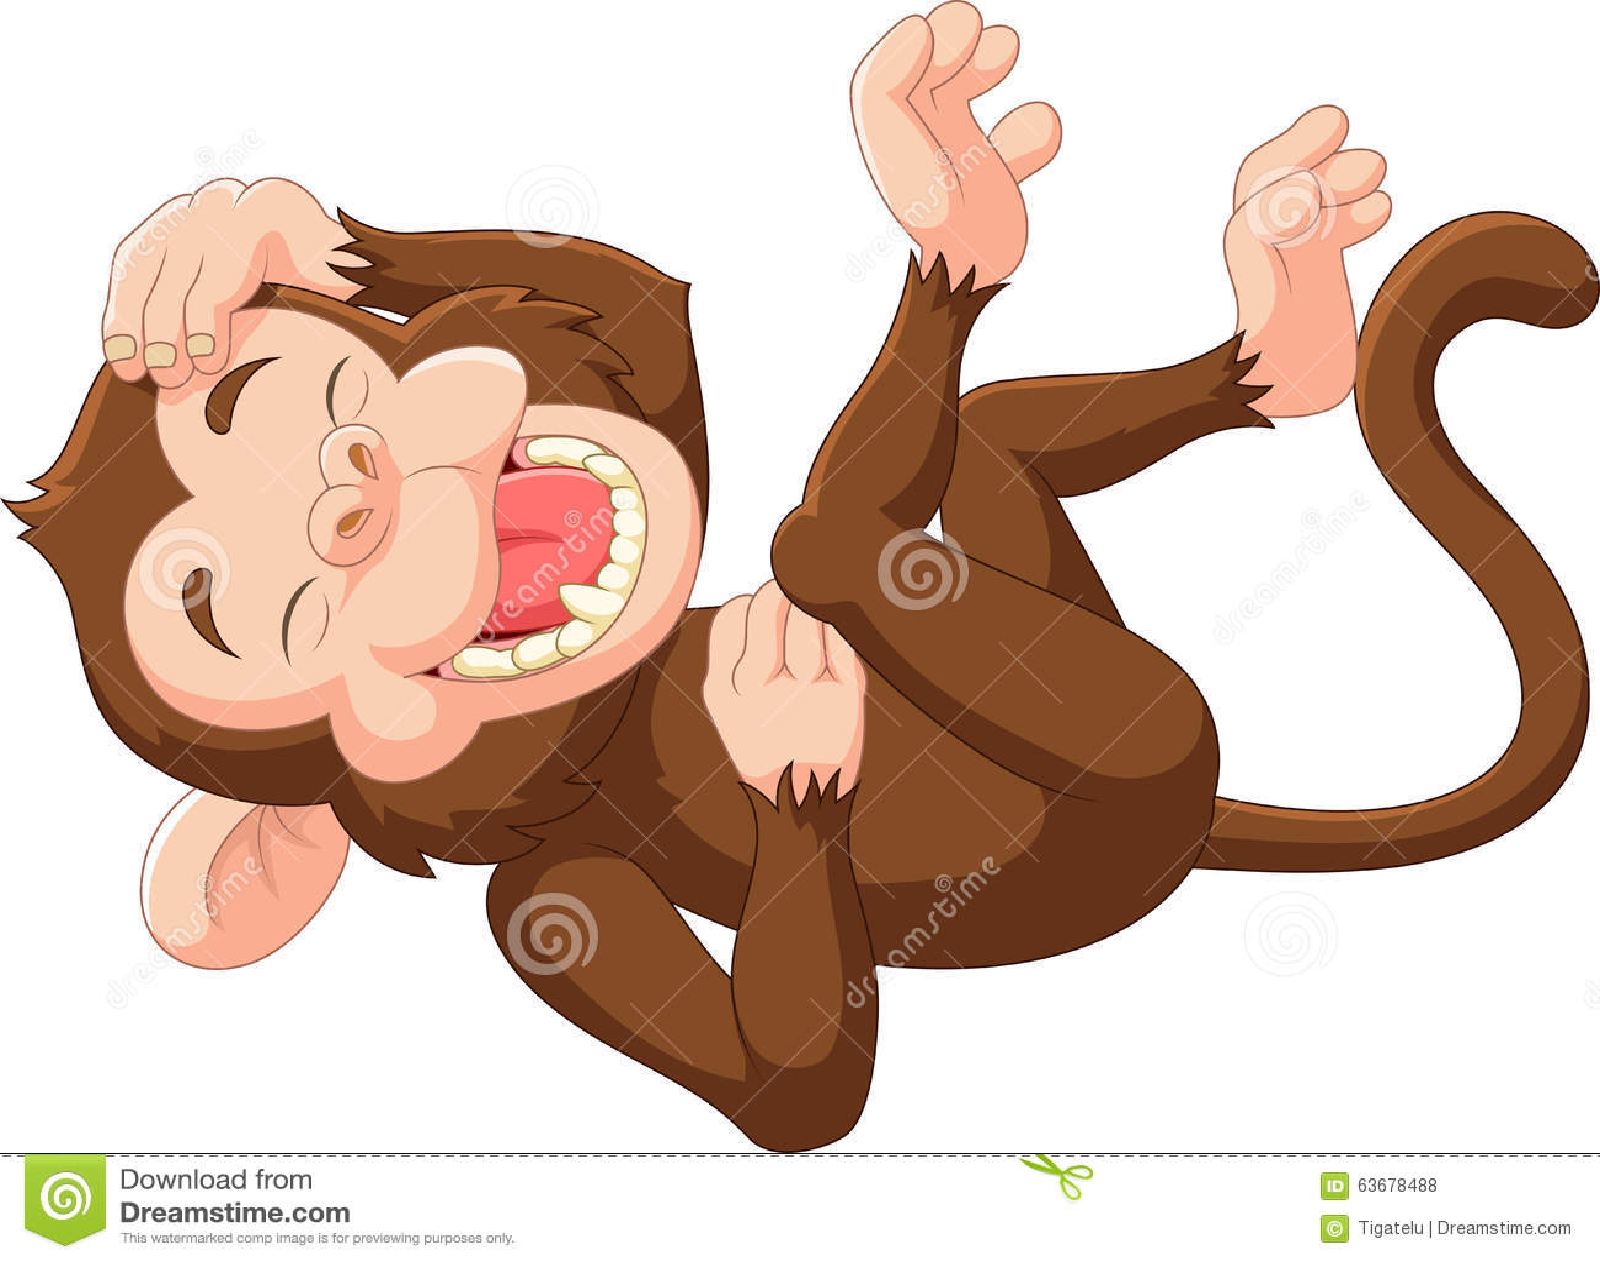 Cartoon funny monkey laughing